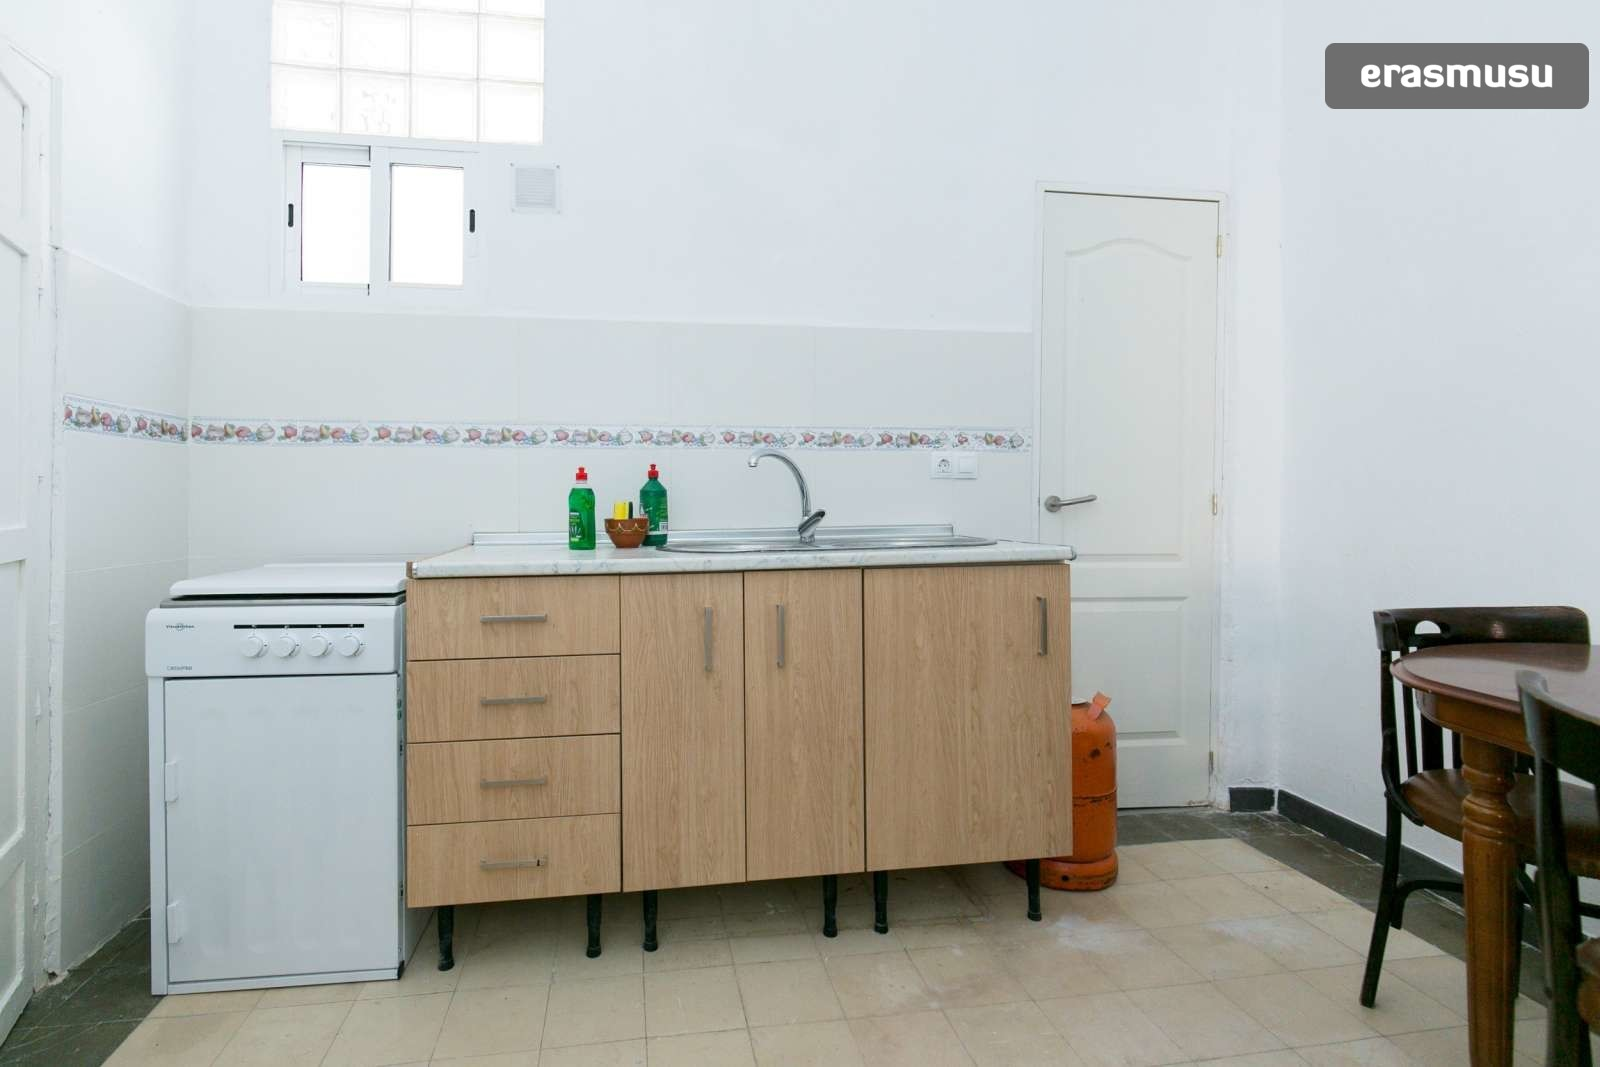 spacious-3-bedroom-apartment-rent-realejo-ff4e700faa237733530e4a